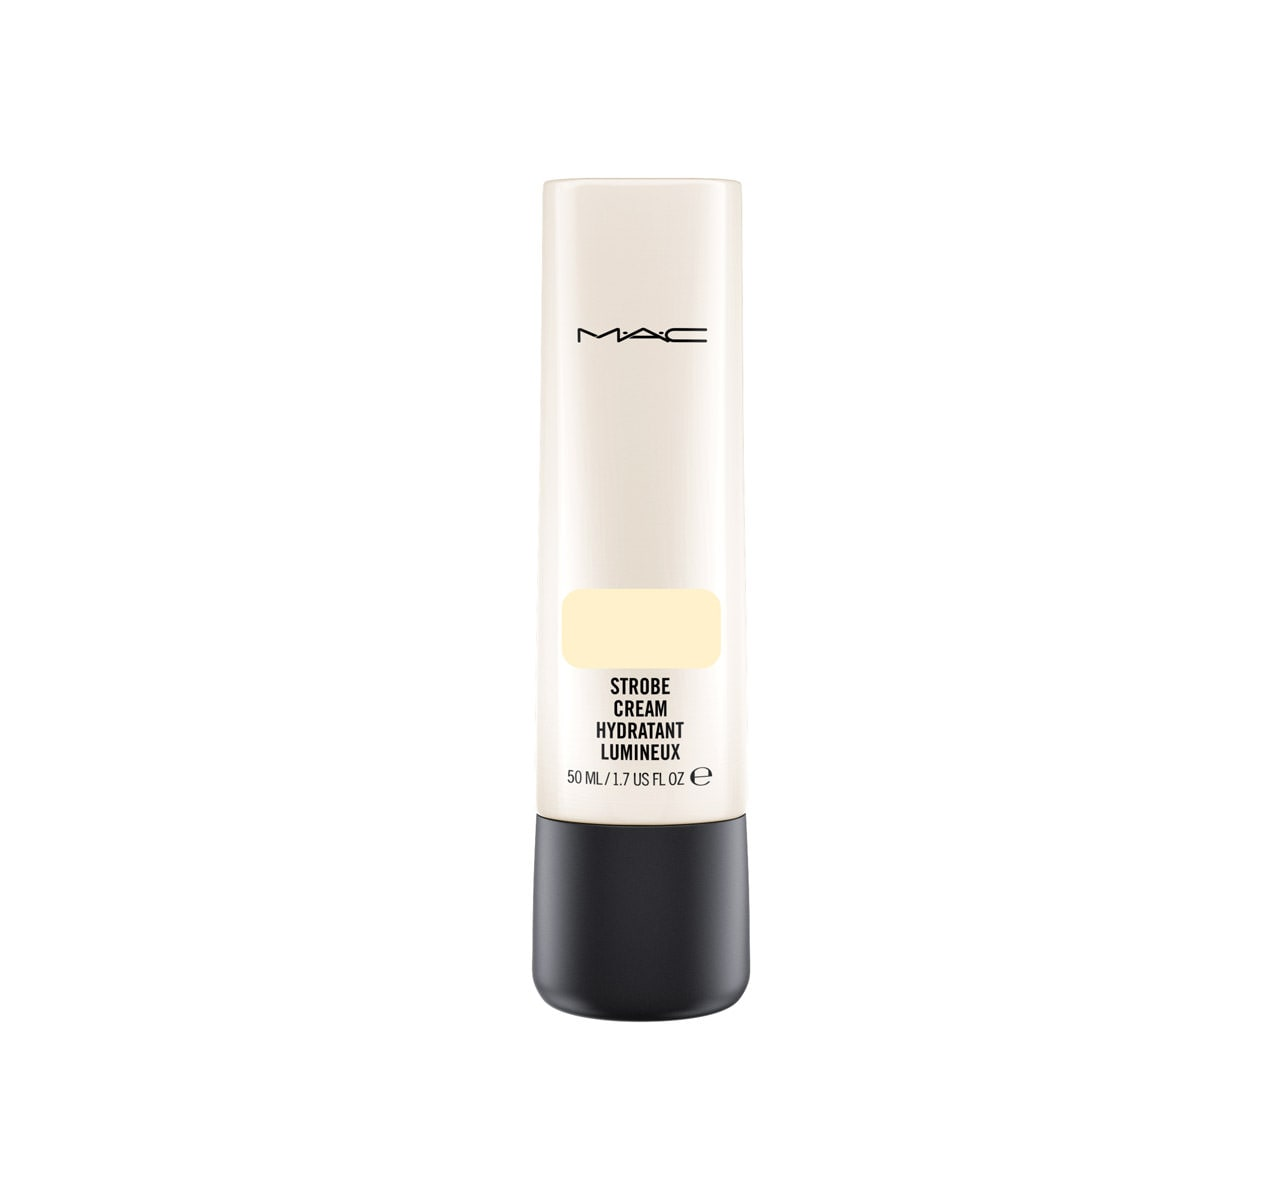 Strobe Cream | MAC Cosmetics - Official Site